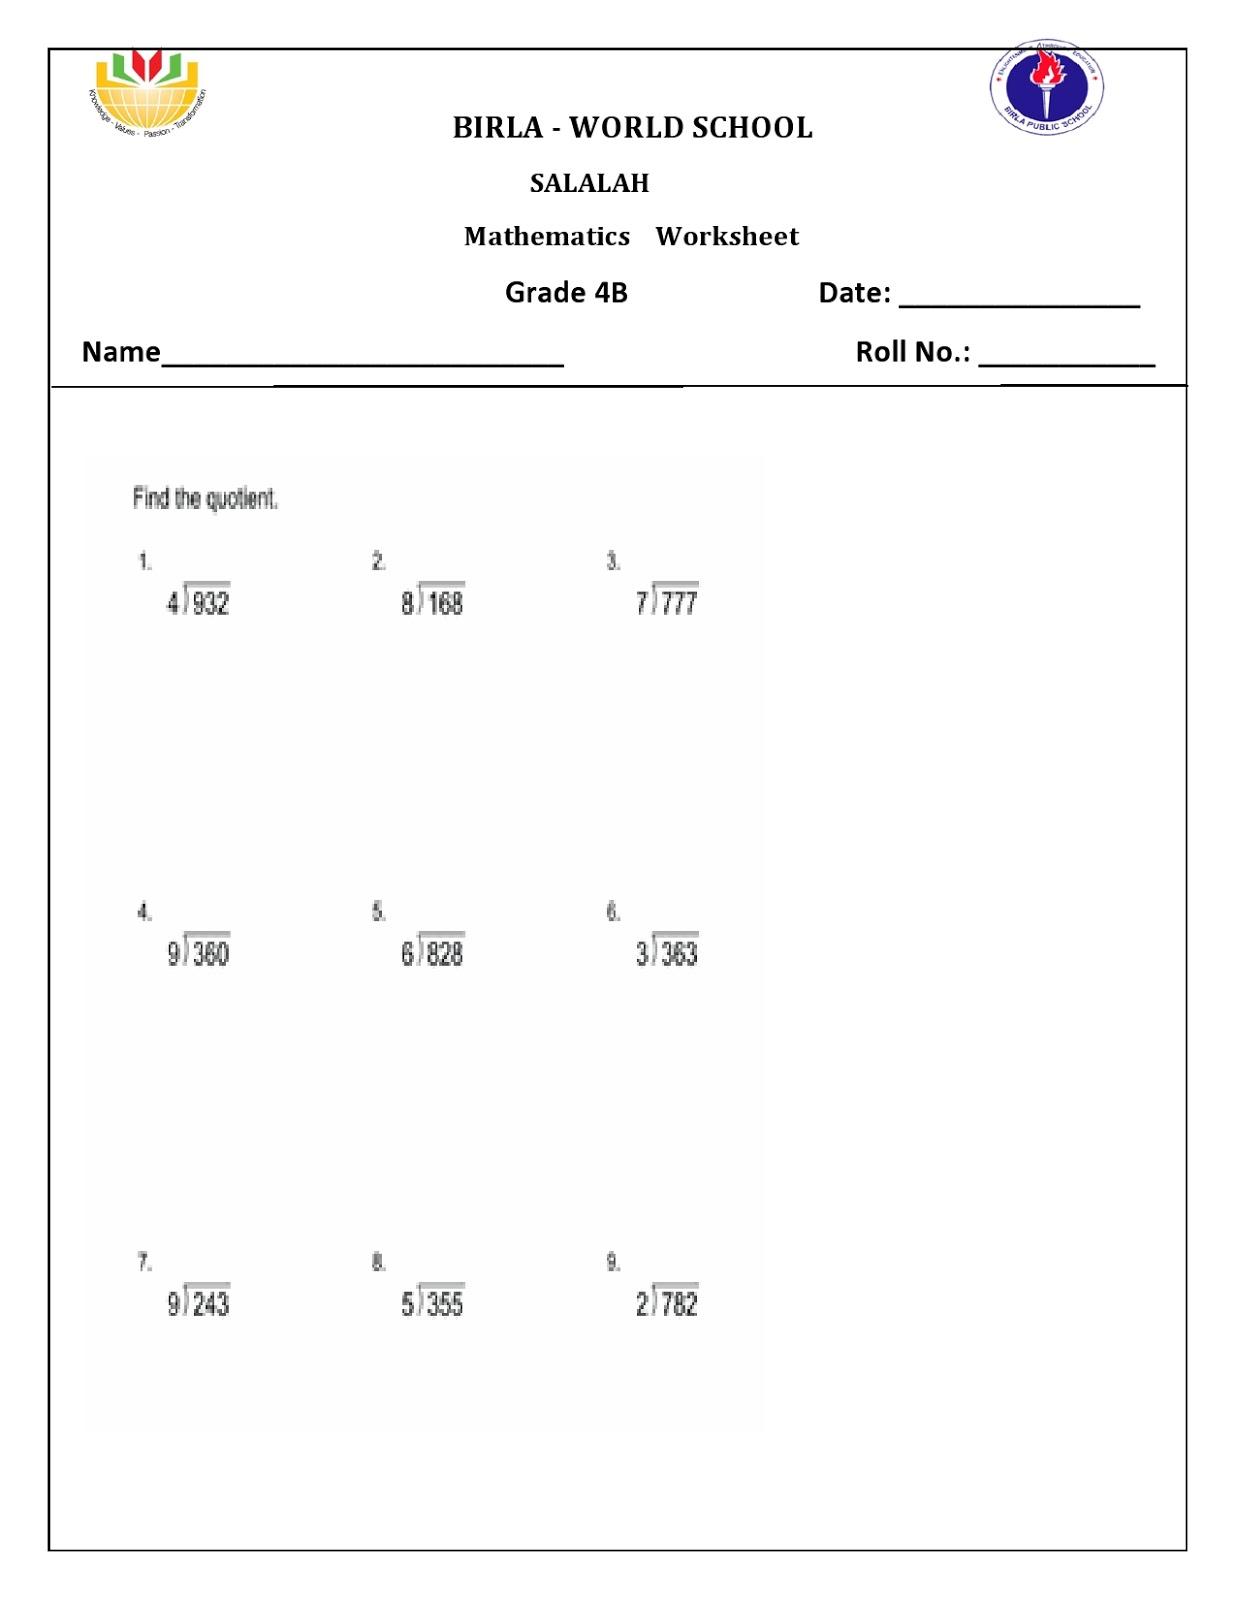 Birla World School Oman Homework For Grade 4 B On 20 10 16